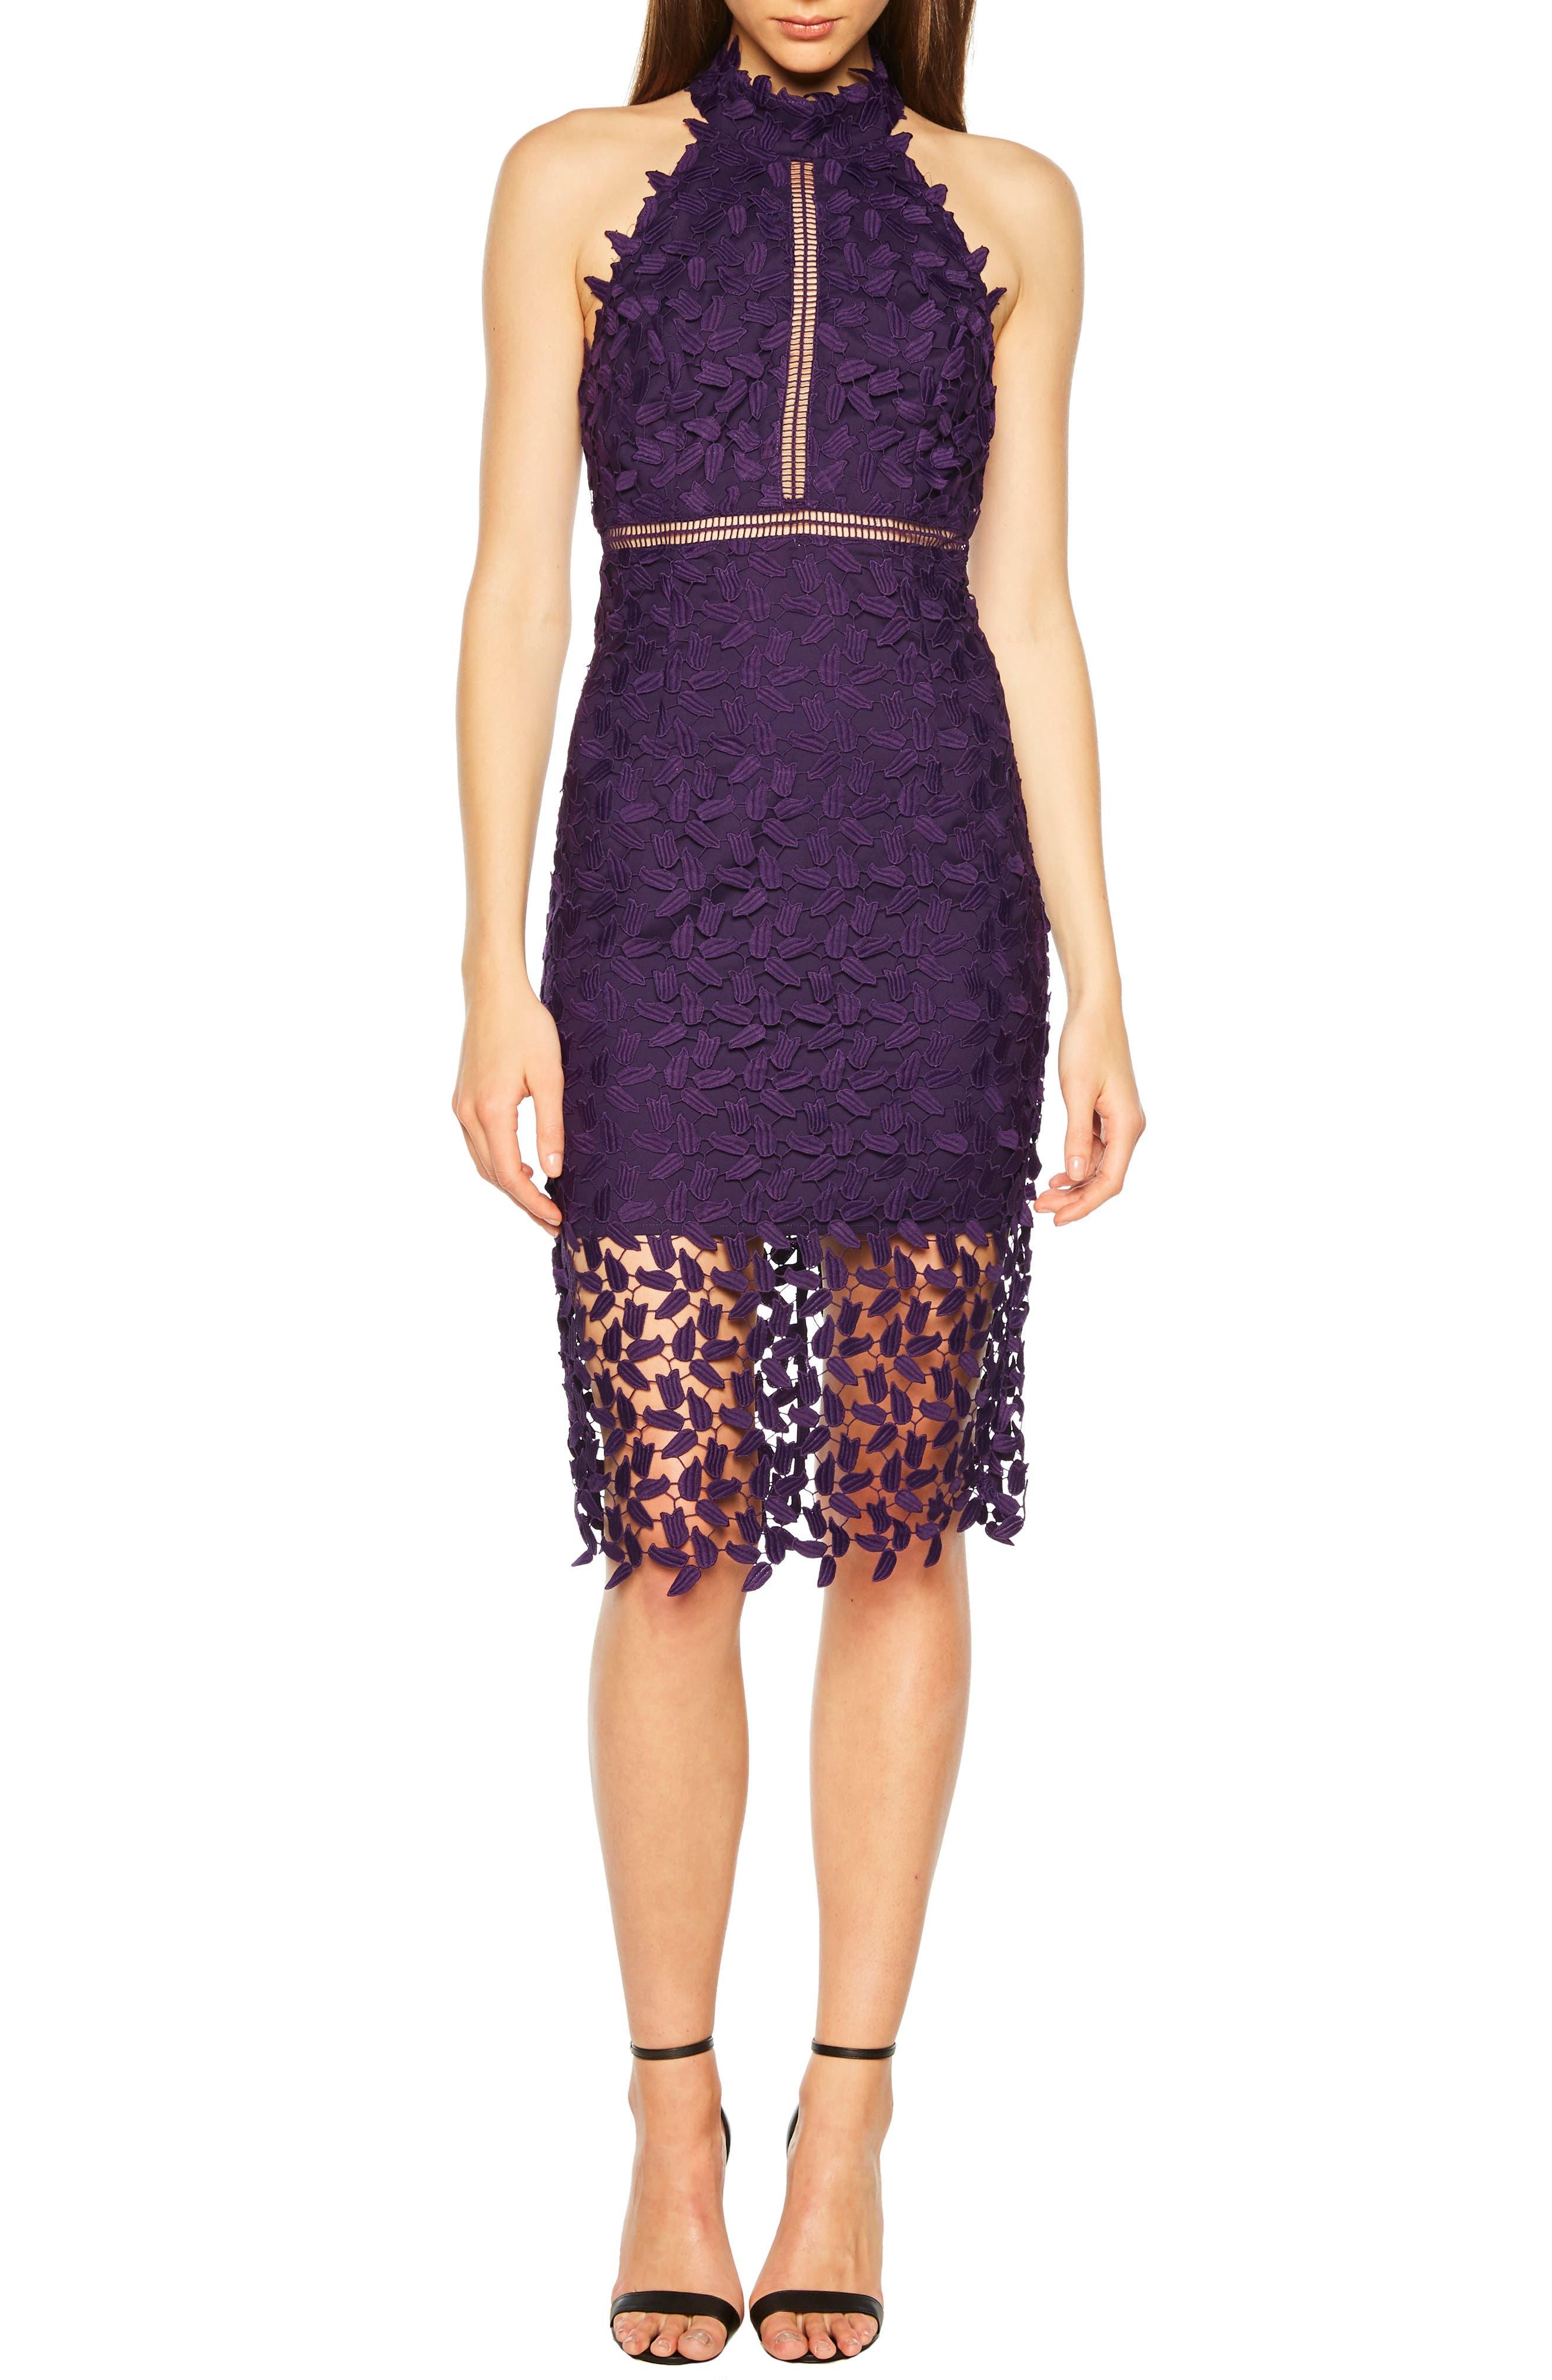 Dark Purple Cocktail Dress